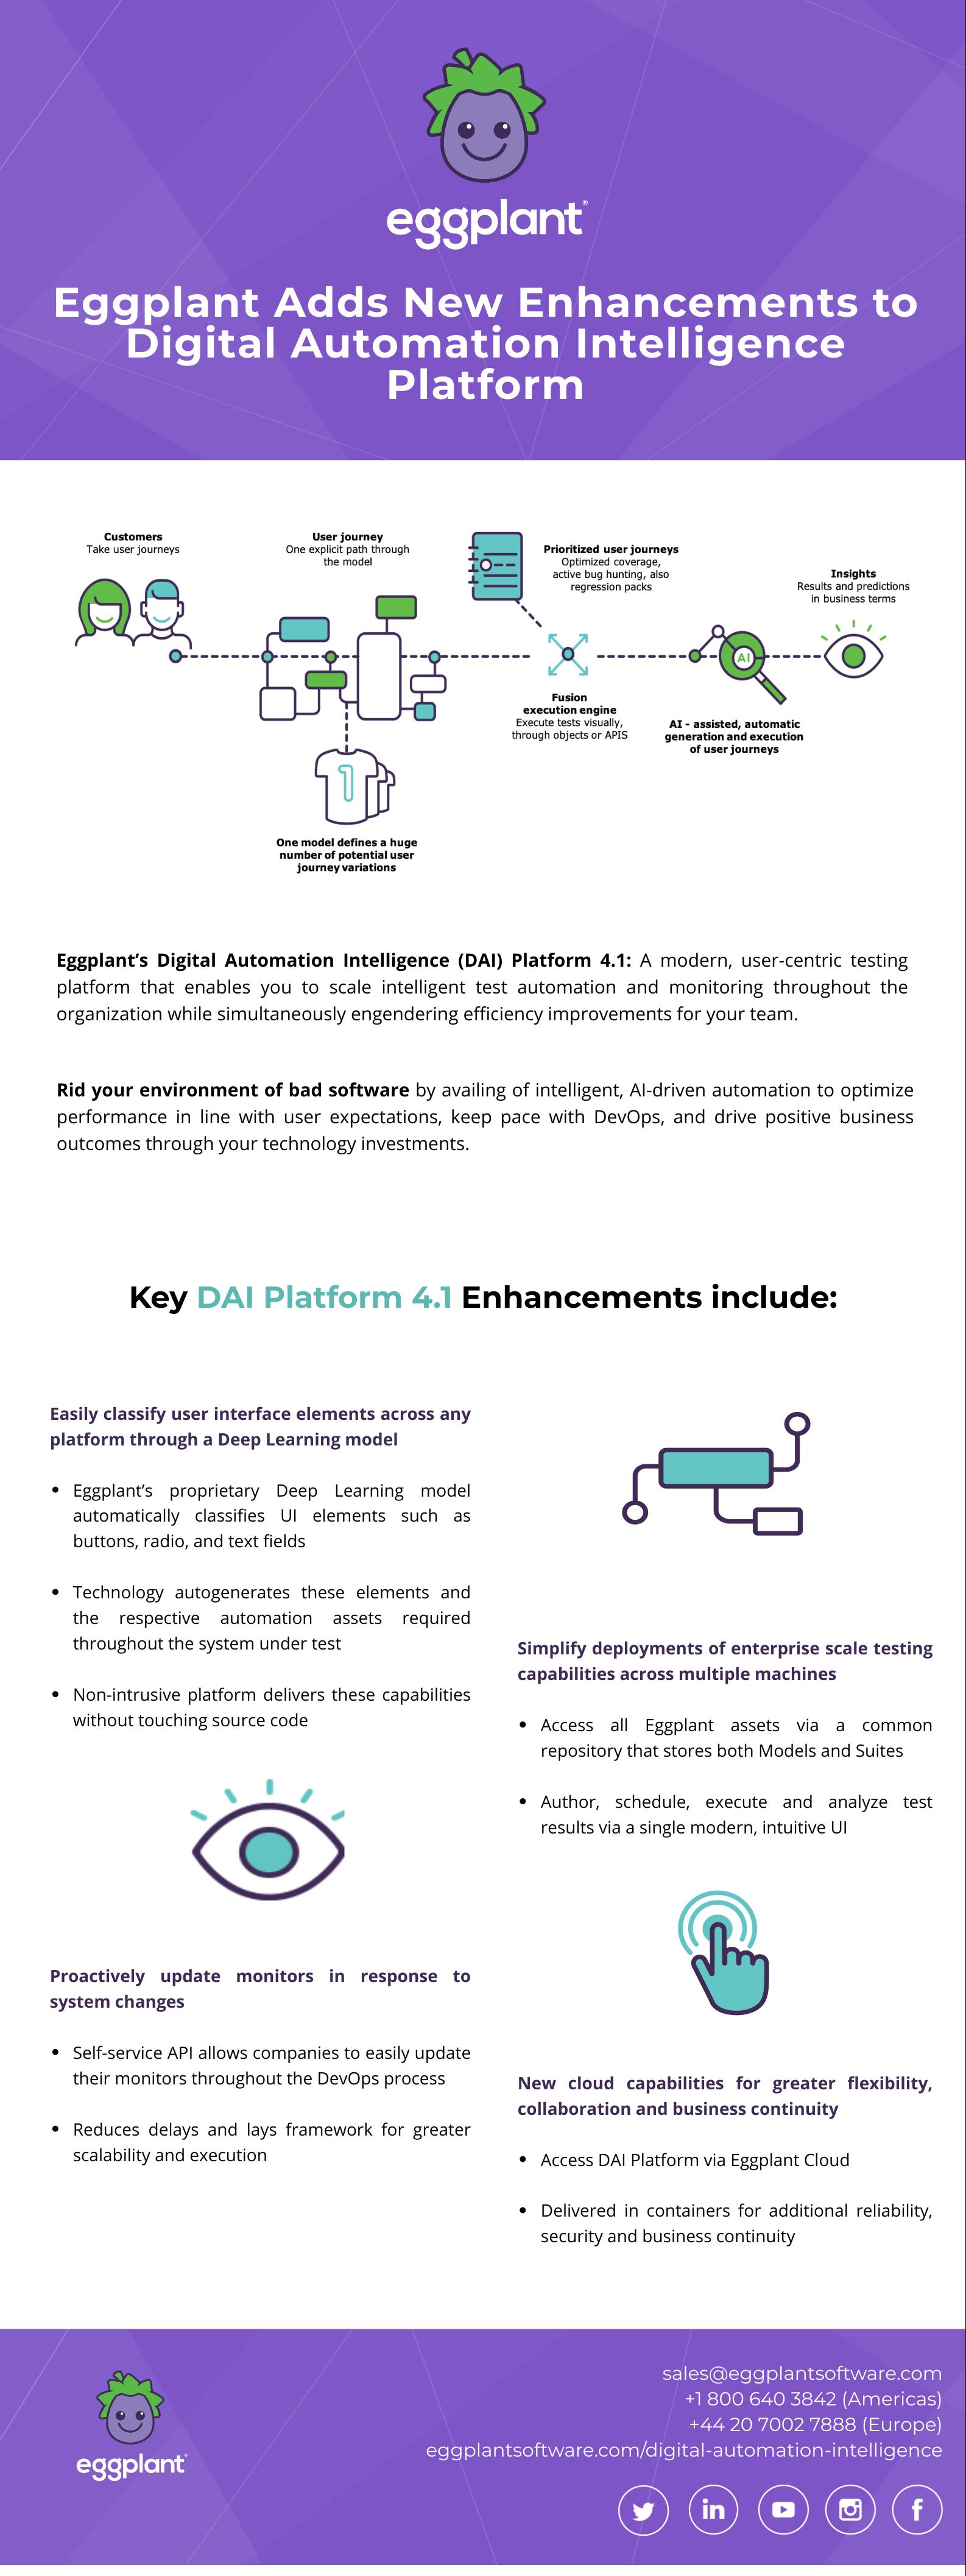 Eggplant adds new enhancements to Digital Automation Intelligence platform